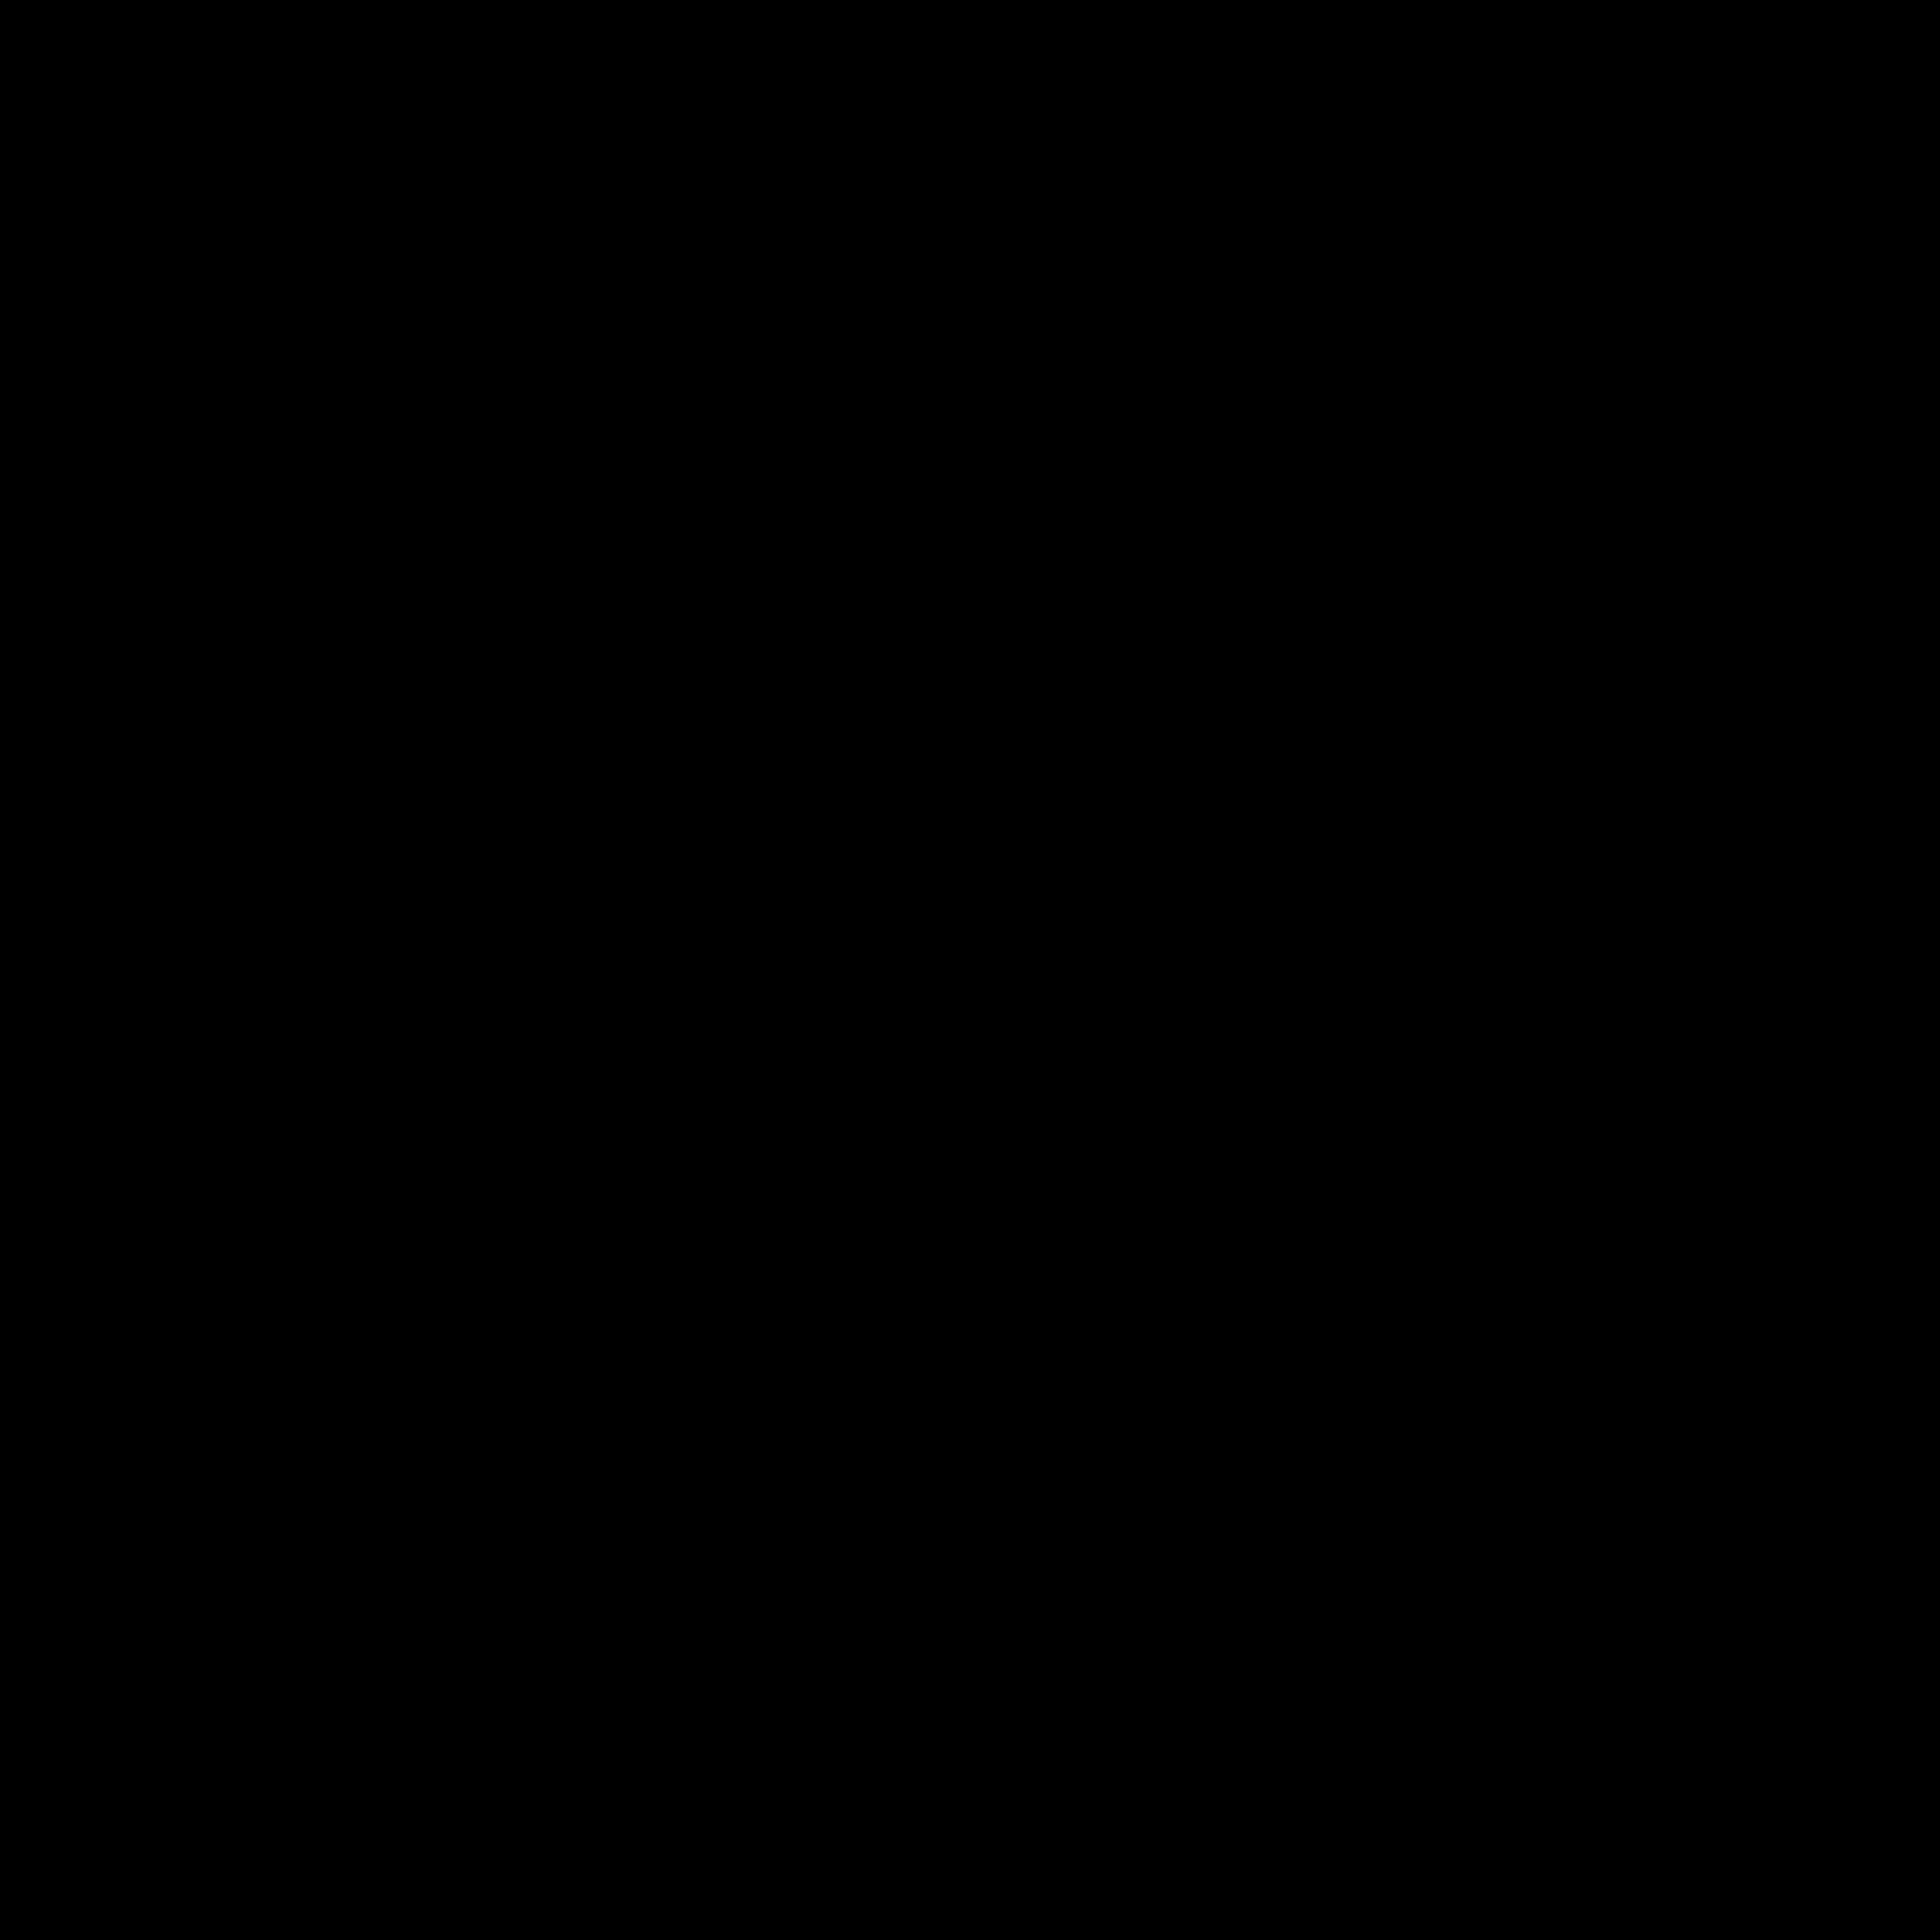 Instagram logo clipart vector vector royalty free library Instagram Logo Eps PNG Transparent Instagram Logo Eps.PNG Images ... vector royalty free library